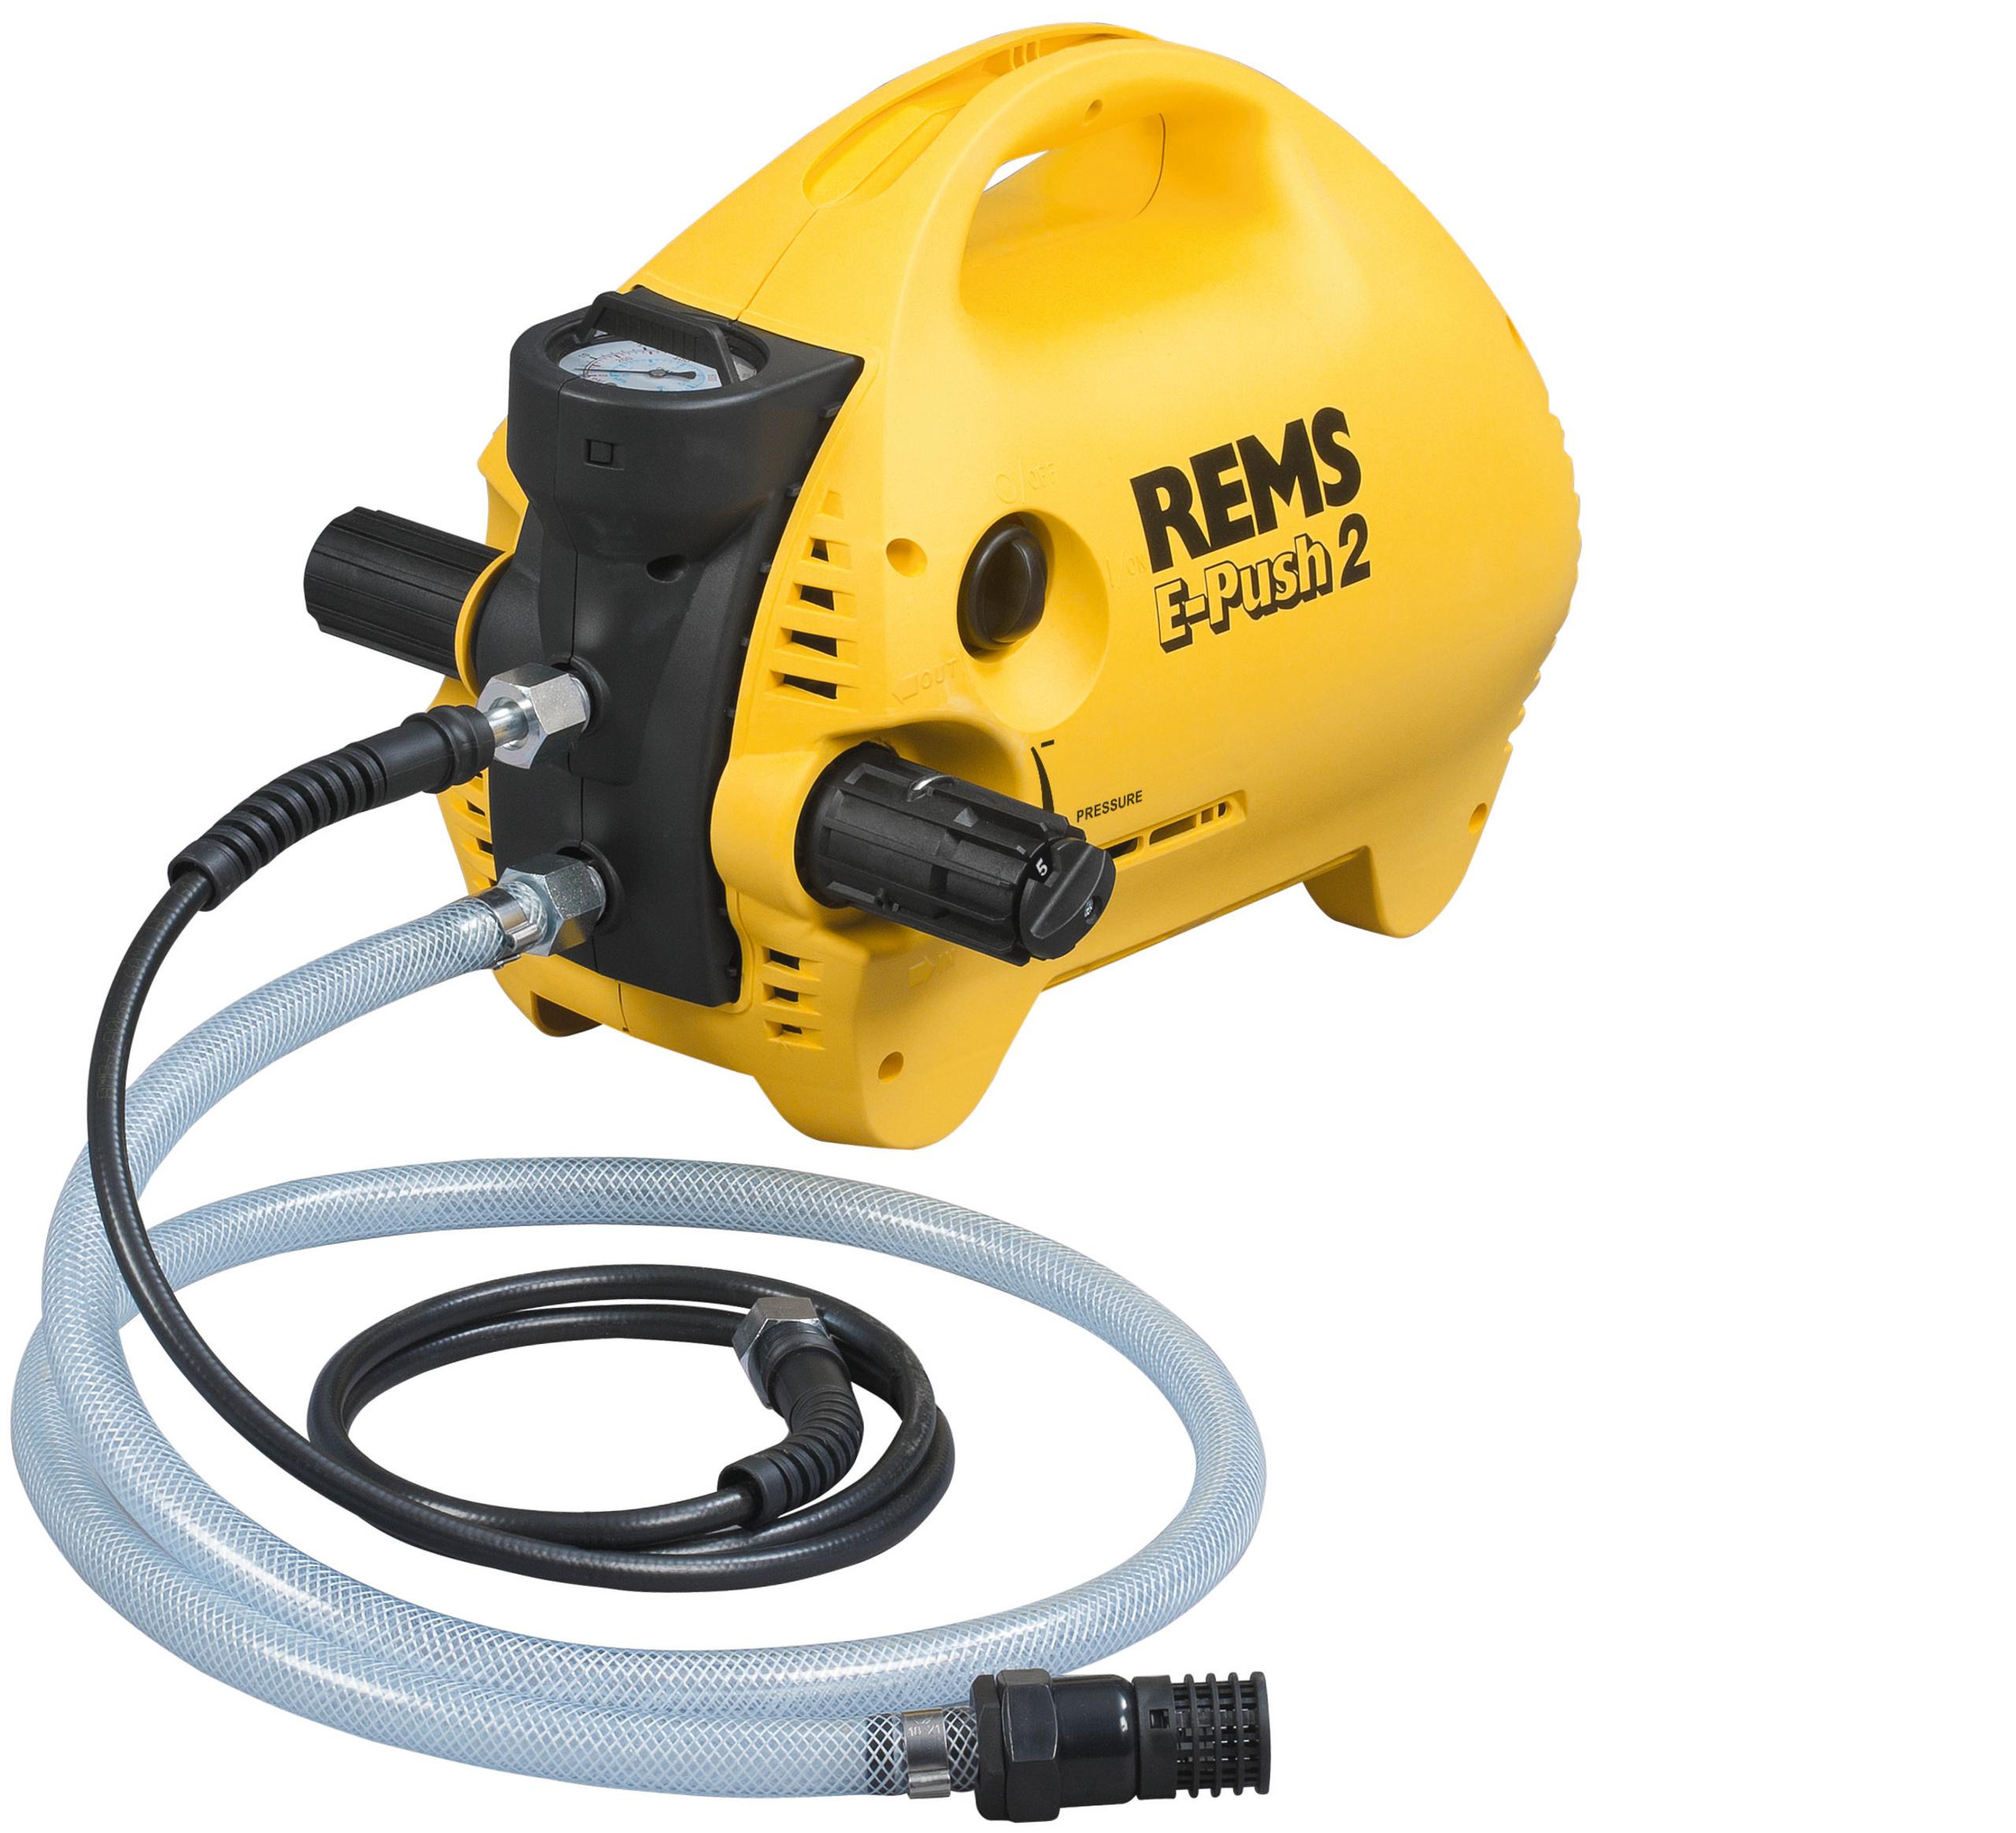 <br/>REMS E-Push 2